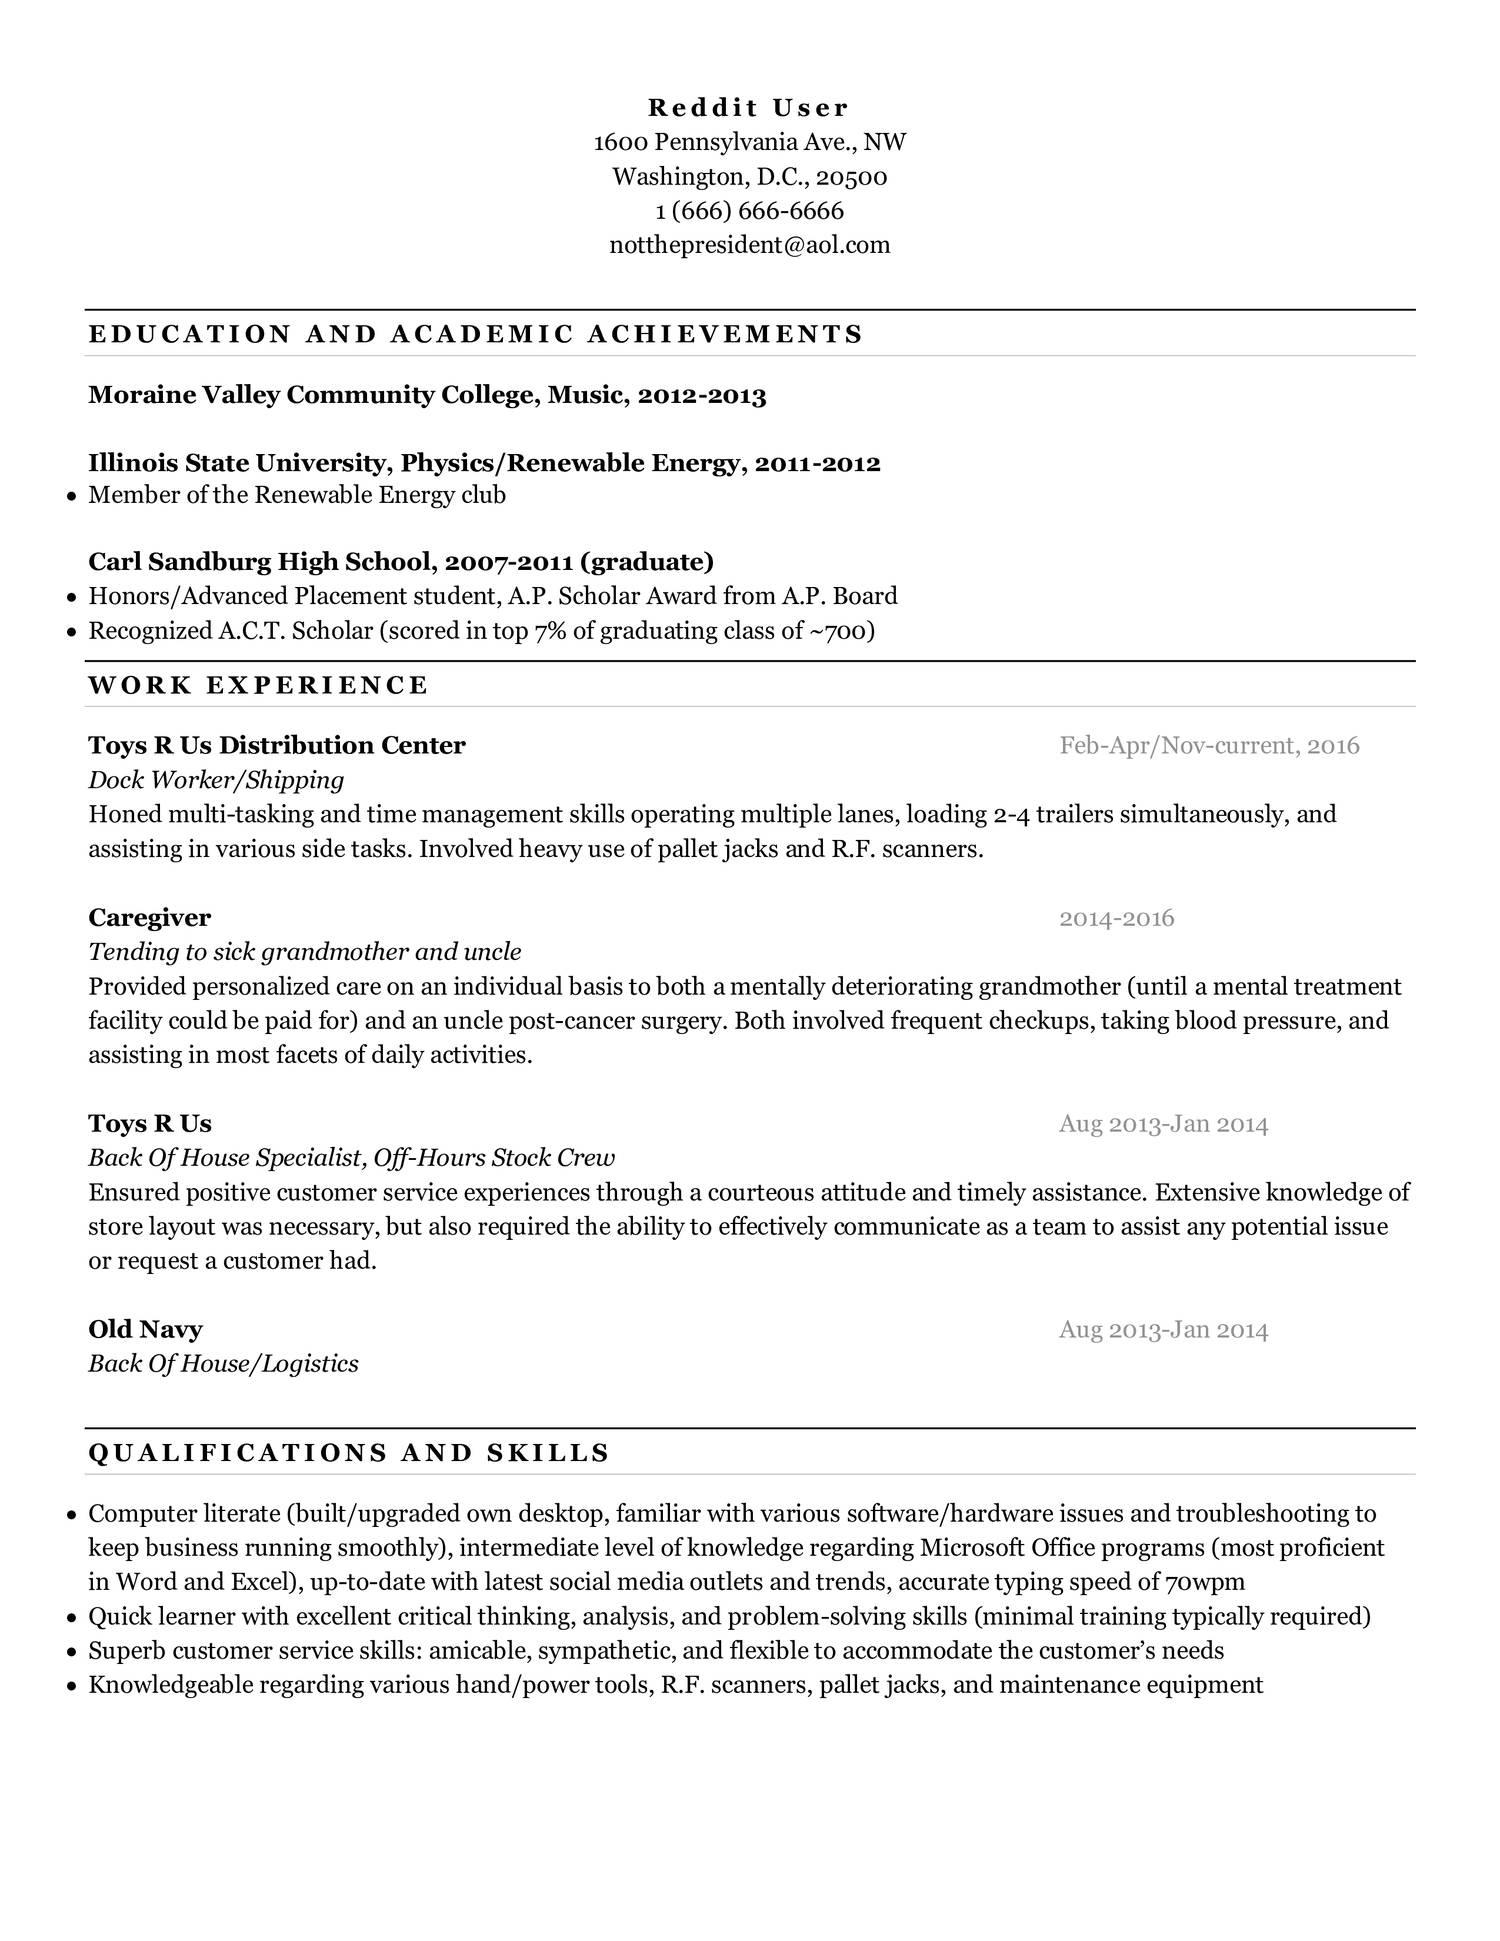 Resume Template Reddit Pdf Docdroid